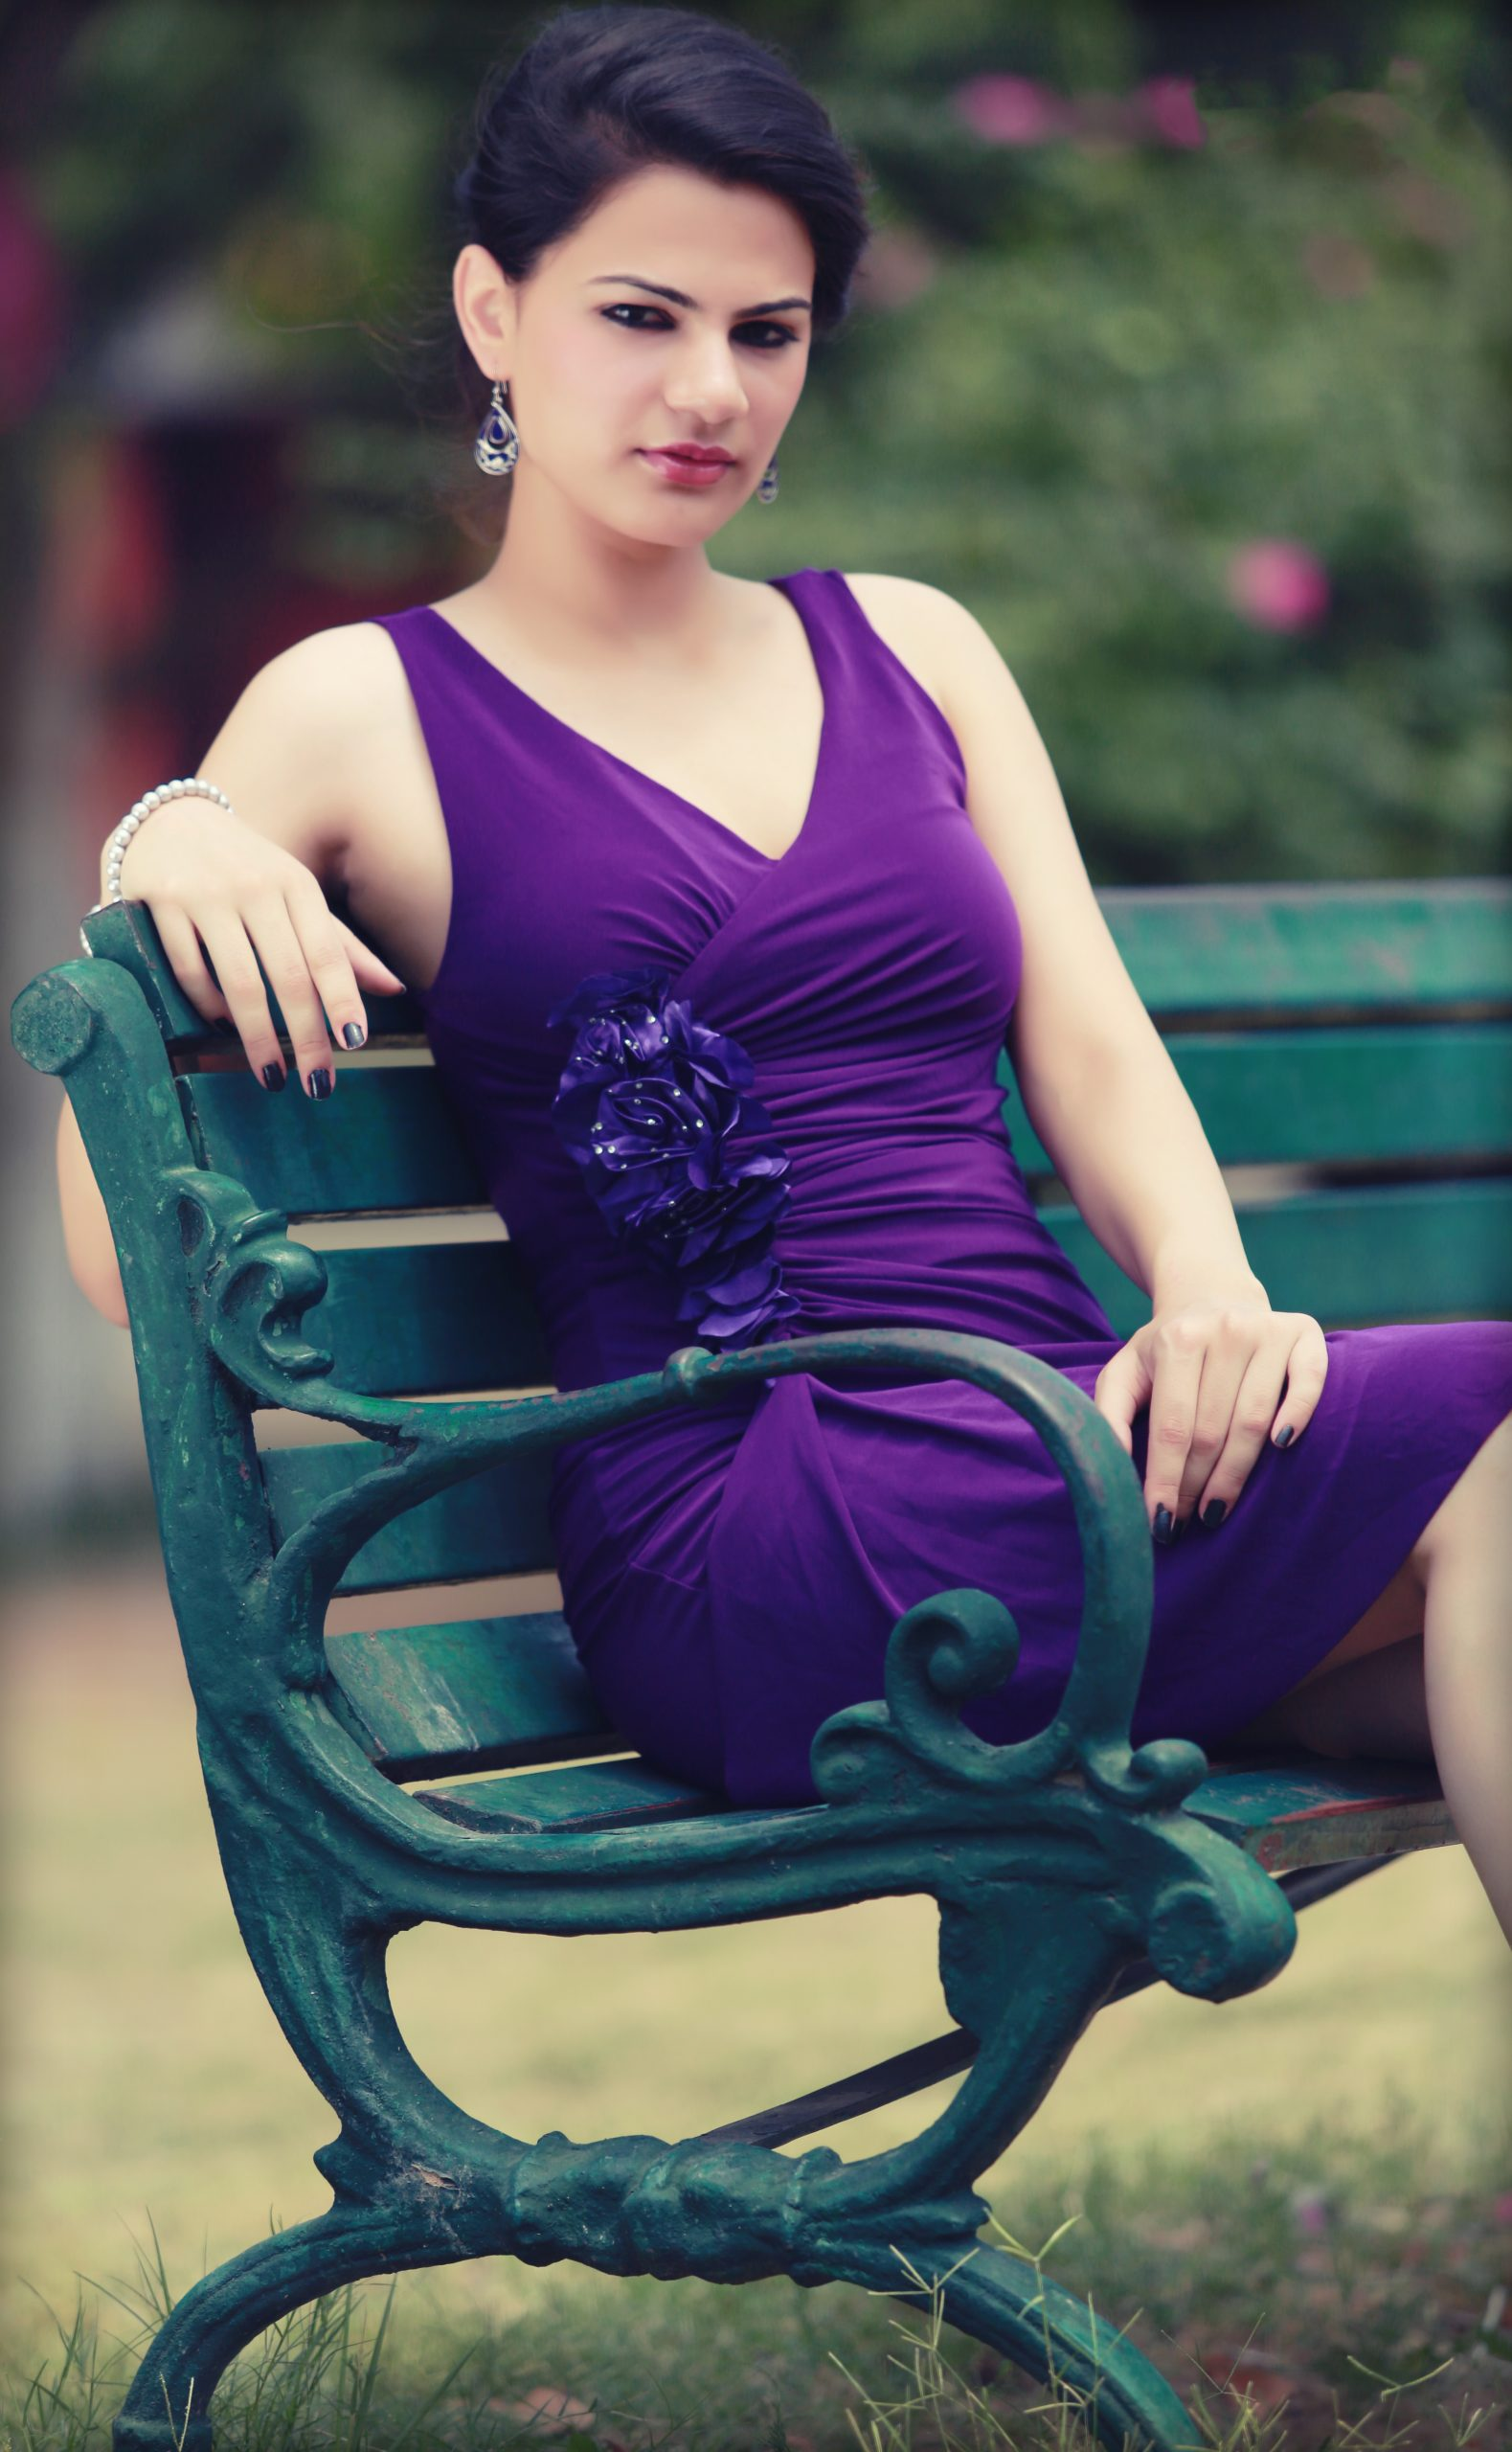 woman posing on bench